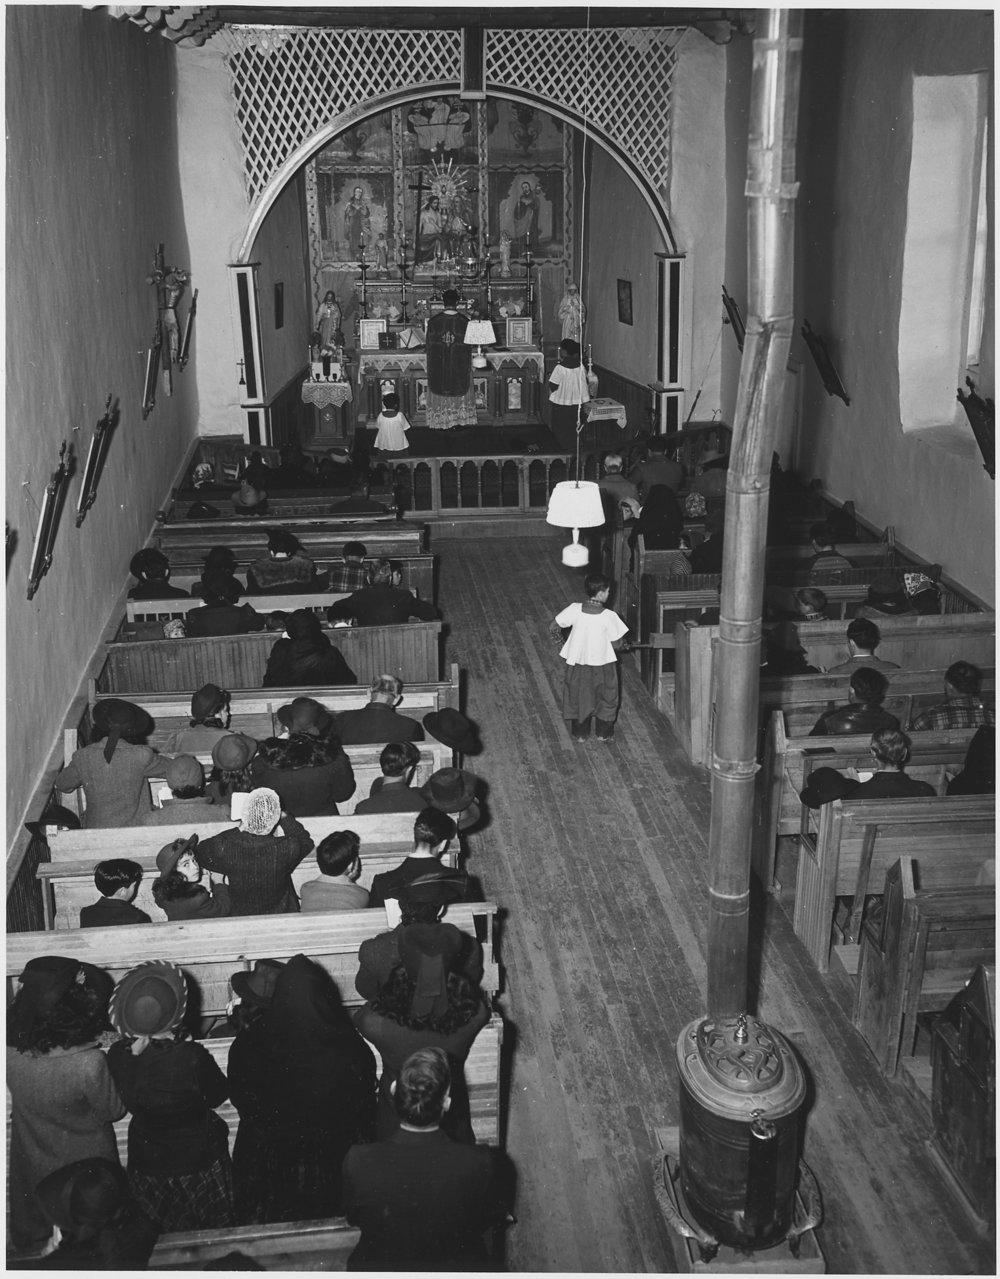 Taos_County,_New_Mexico._Mass_at_Arroyo_Seco_church_-_NARA_-_521926.jpg